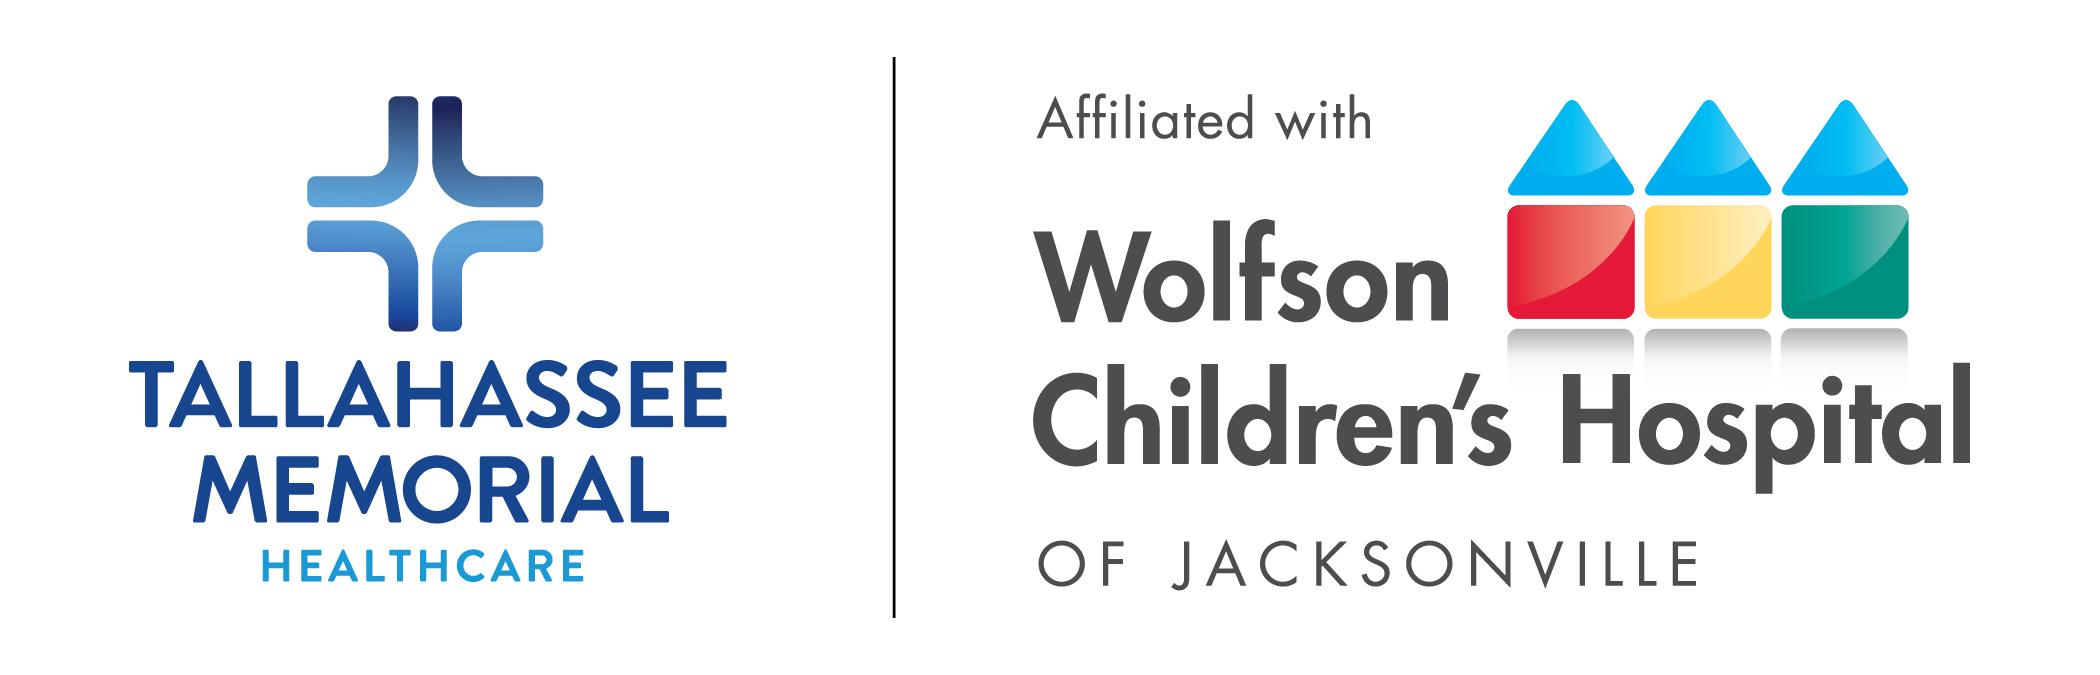 Tallahassee Memorial and Wolfson Children's Logos